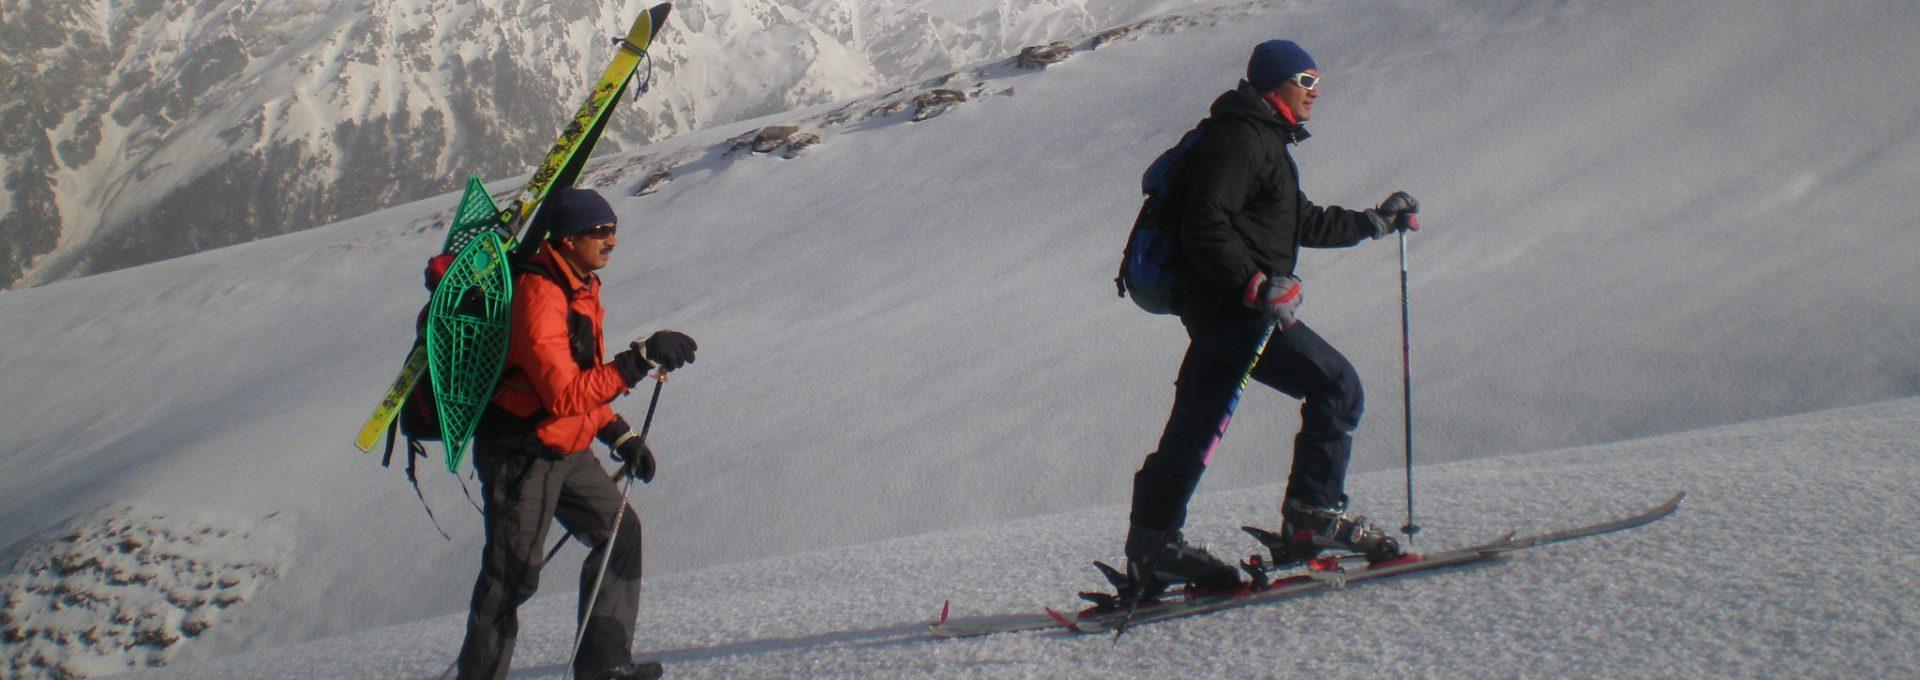 Himachal Tour and Treks